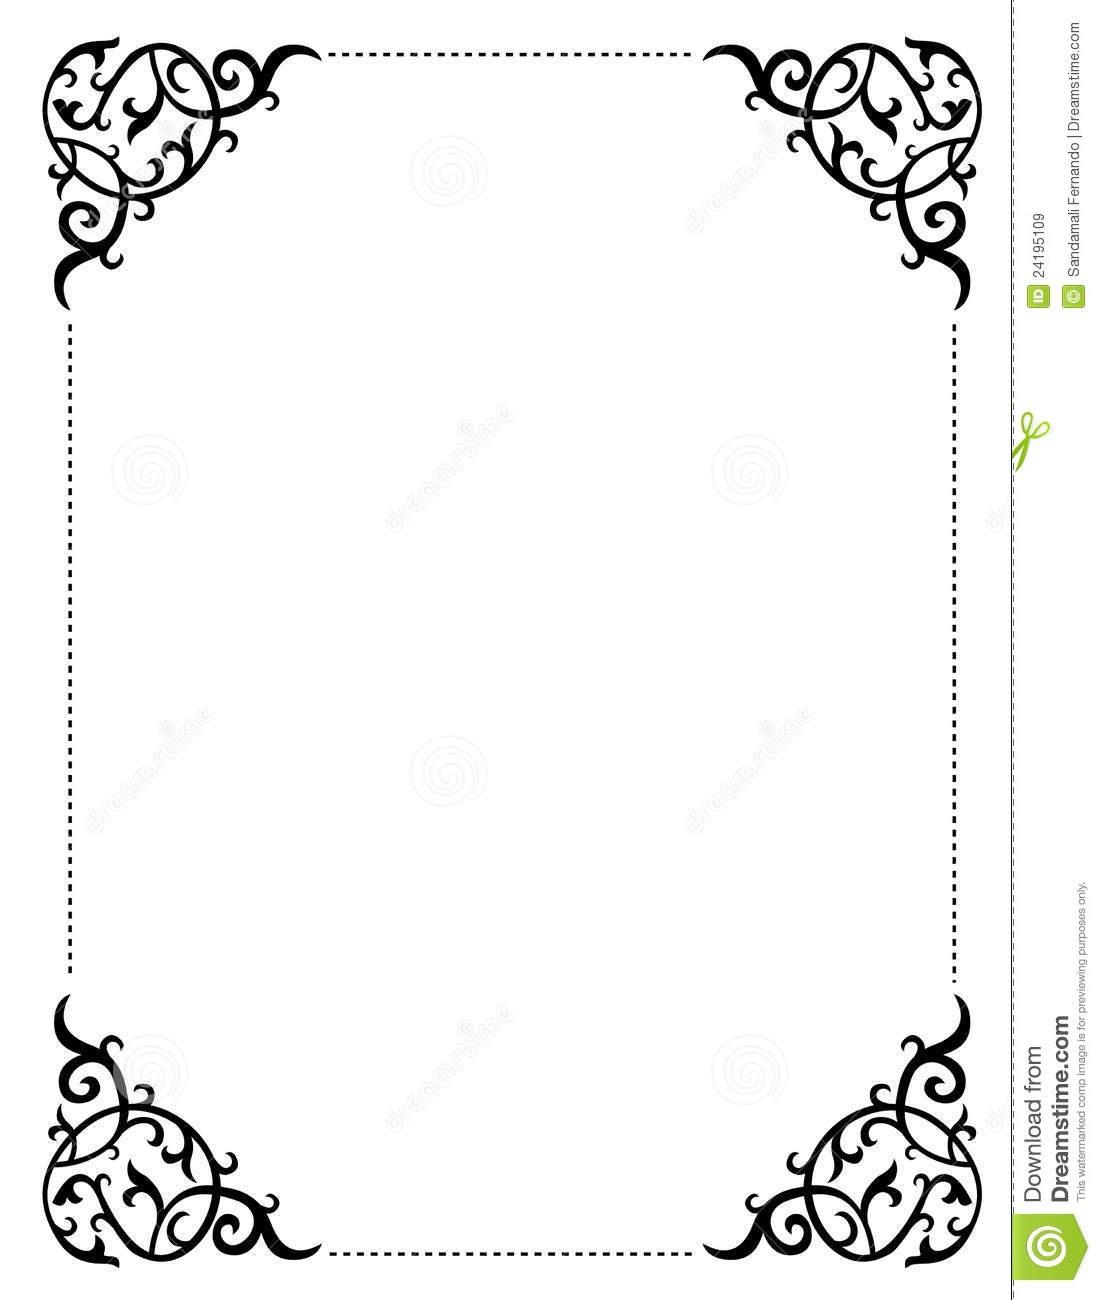 Wedding Scrolls Clipart | Free Download Best Wedding Scrolls Clipart - Free Printable Wedding Scrolls